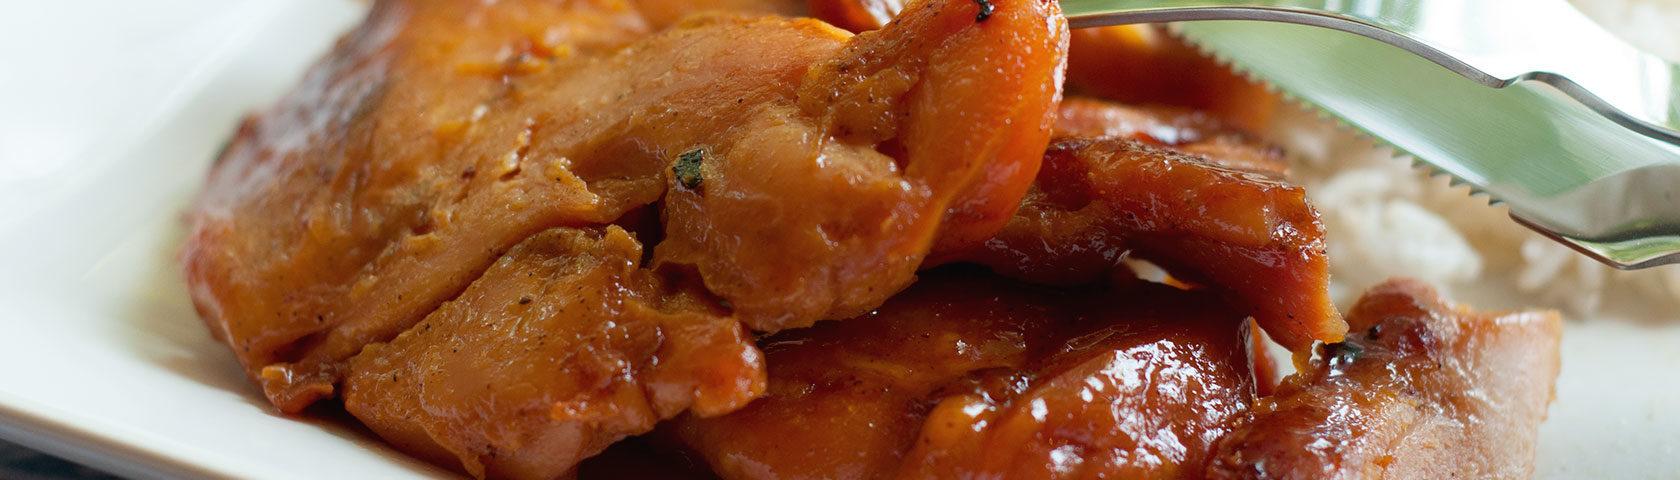 Tocino & Tapa – Martin Purefoods Corporation